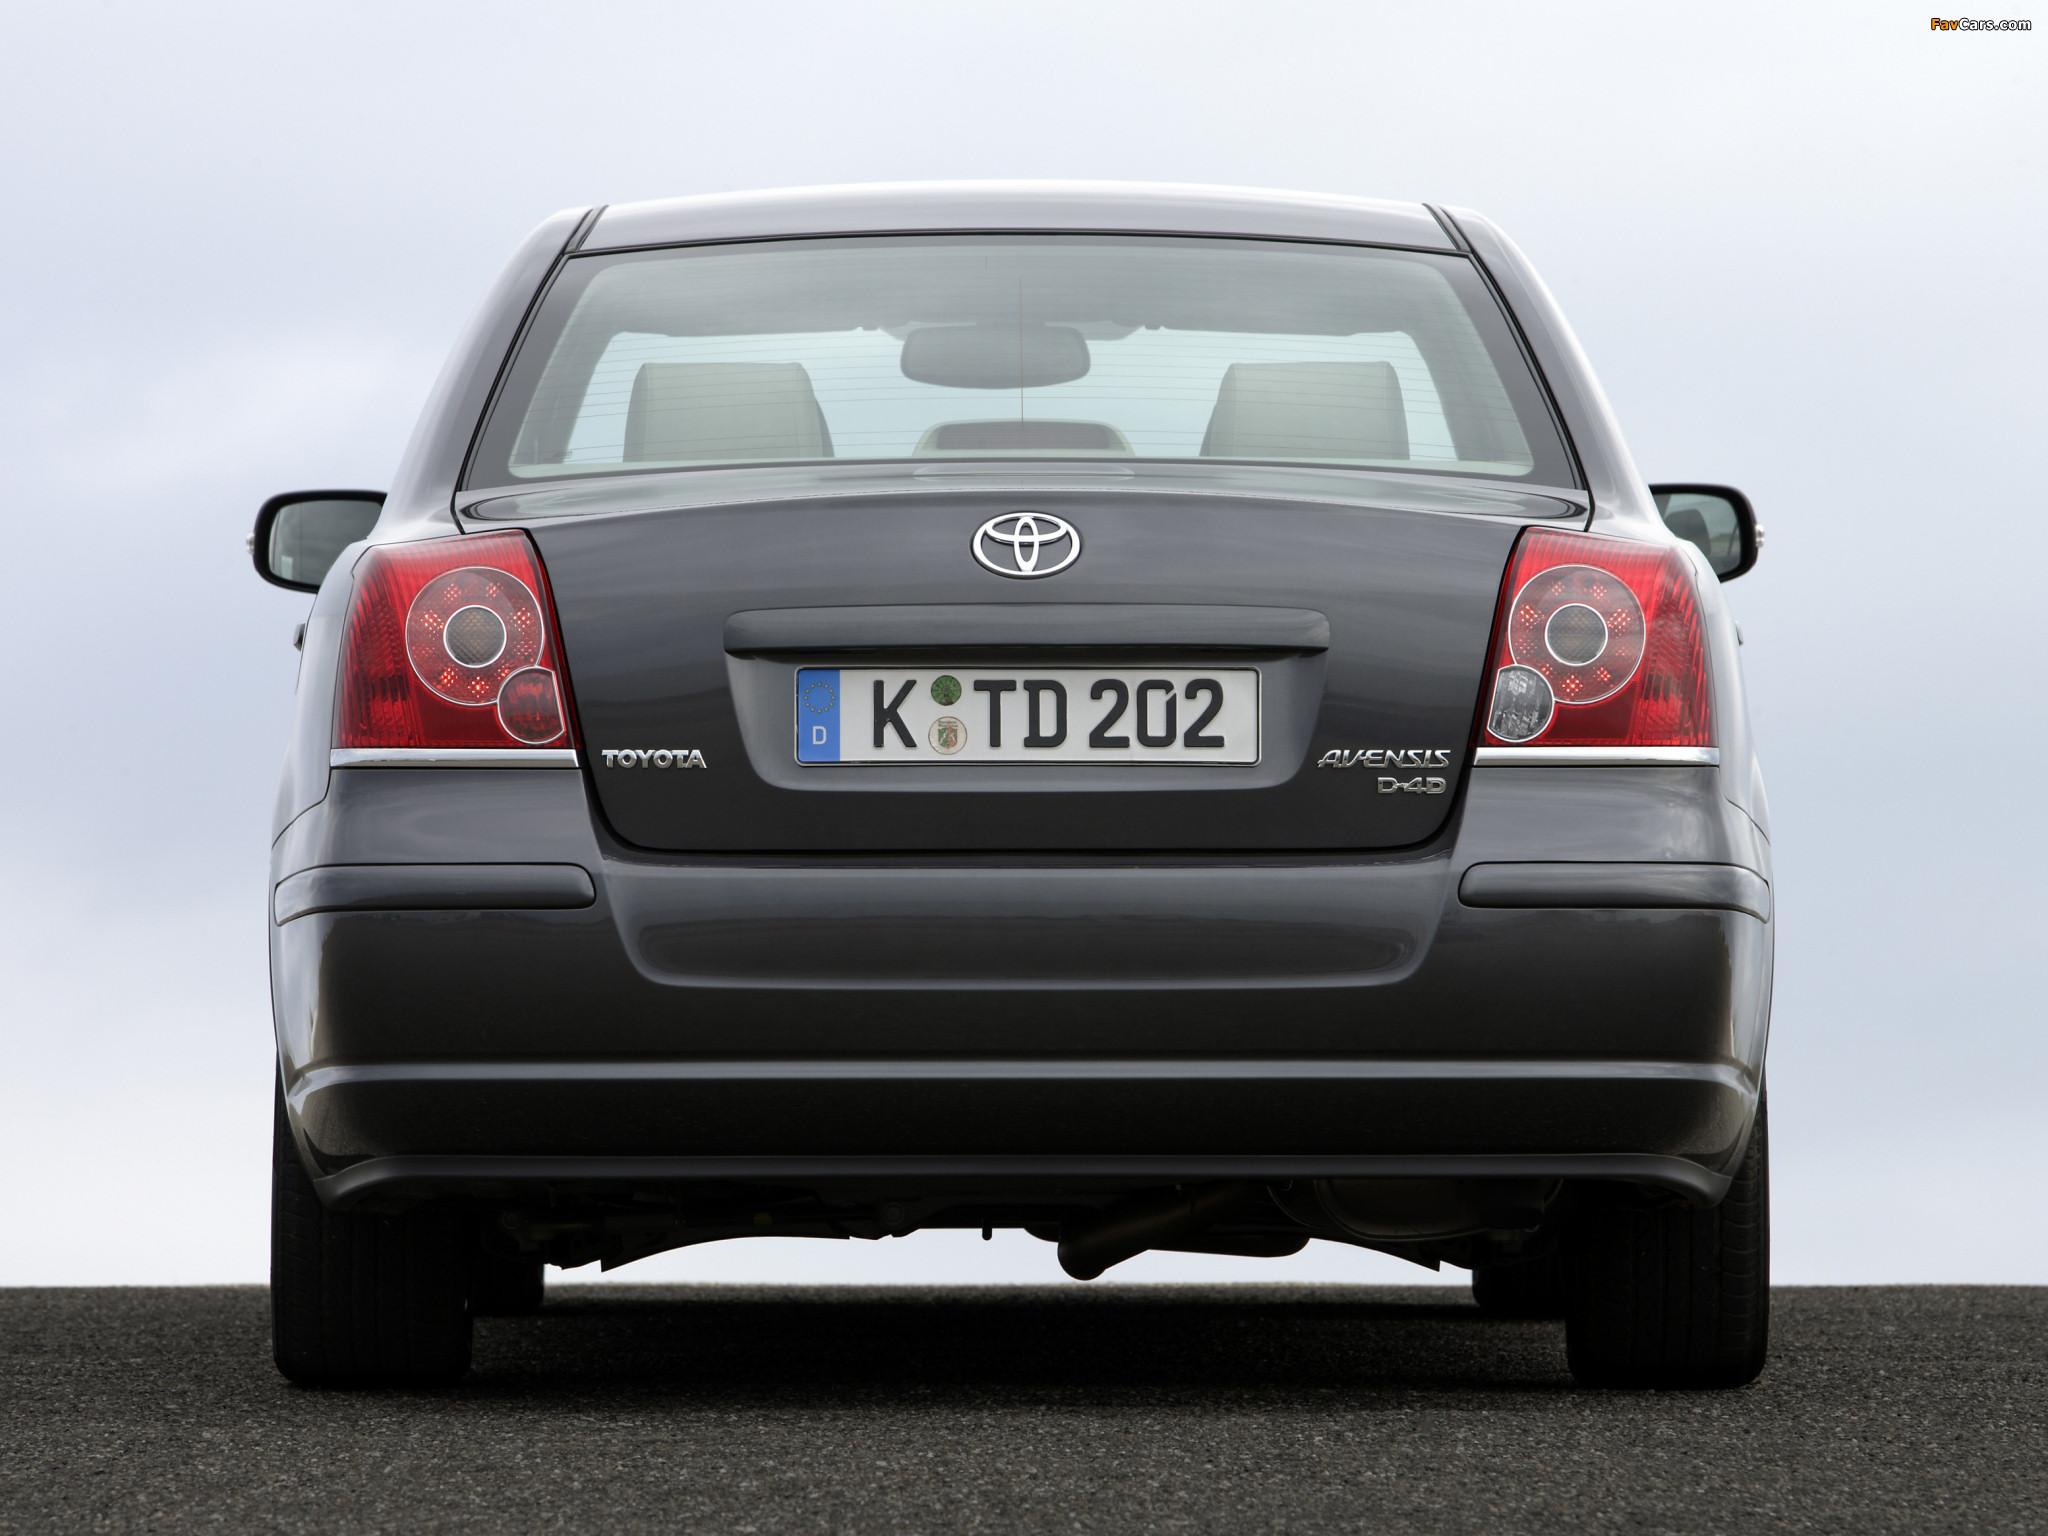 Toyota avensis 2007 1 8 MT